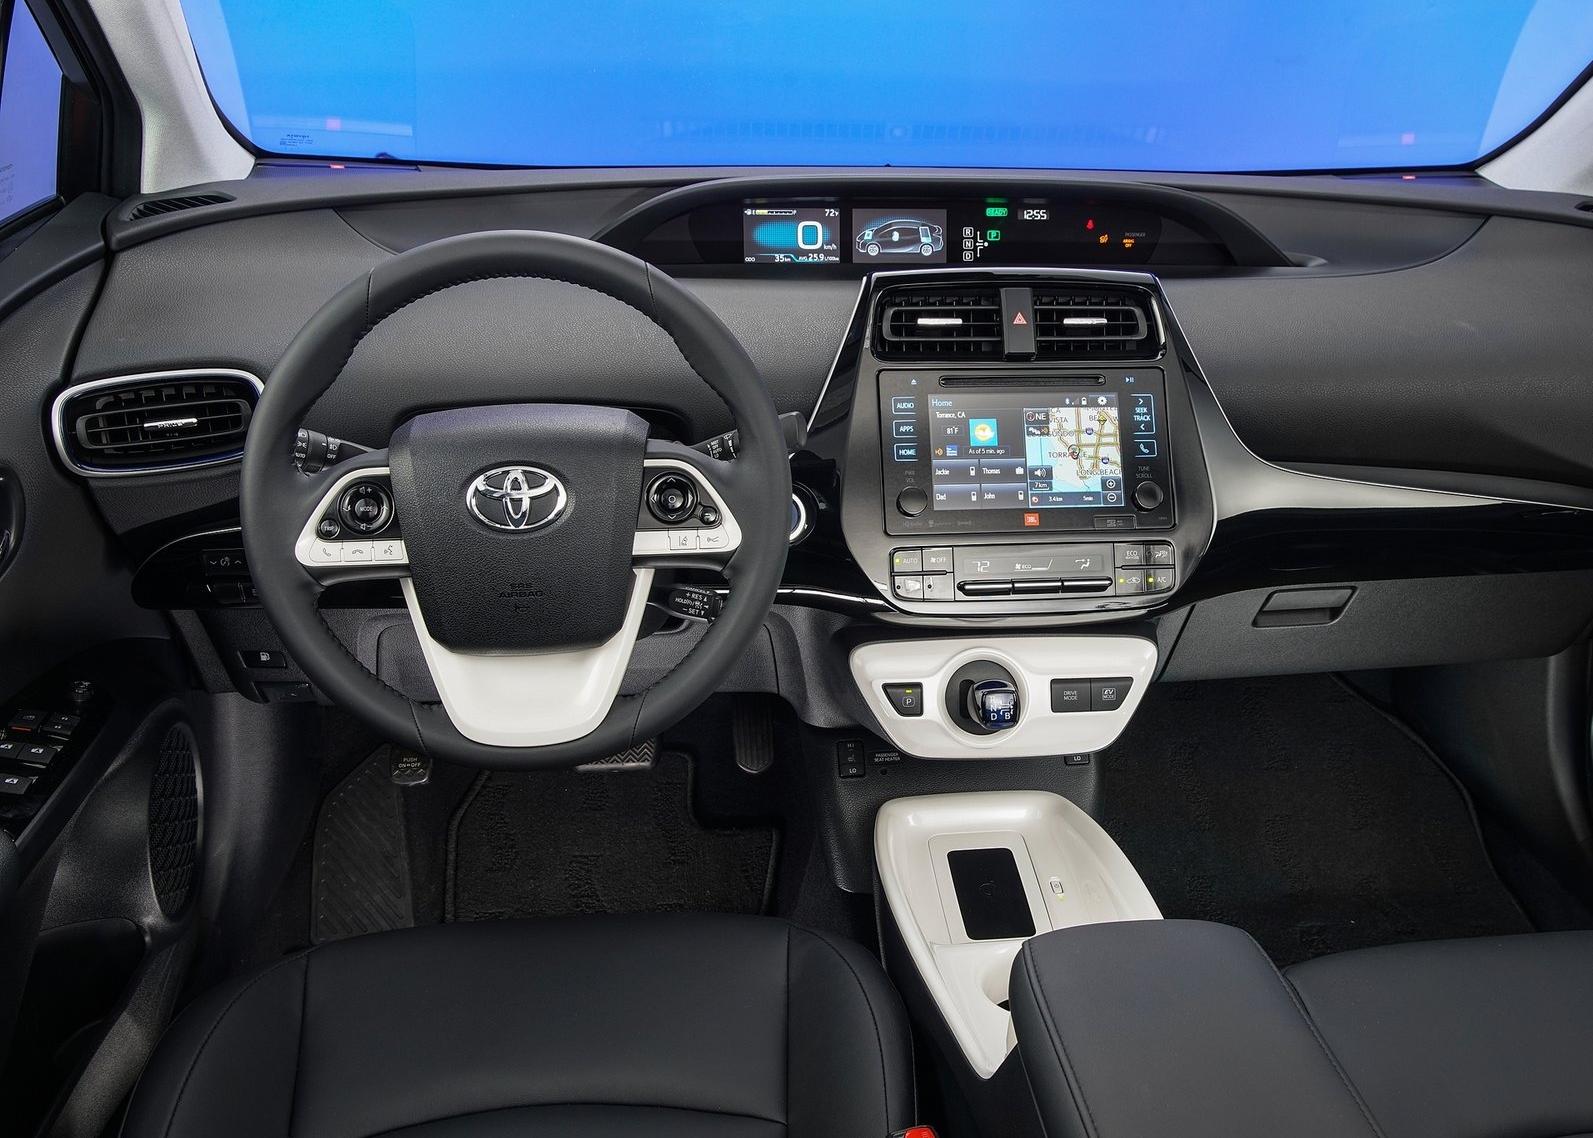 https://www.whatcar.lv/cars/Toyota/Prius/bc35c0214860d47f19ac62a37dfcd966.jpg